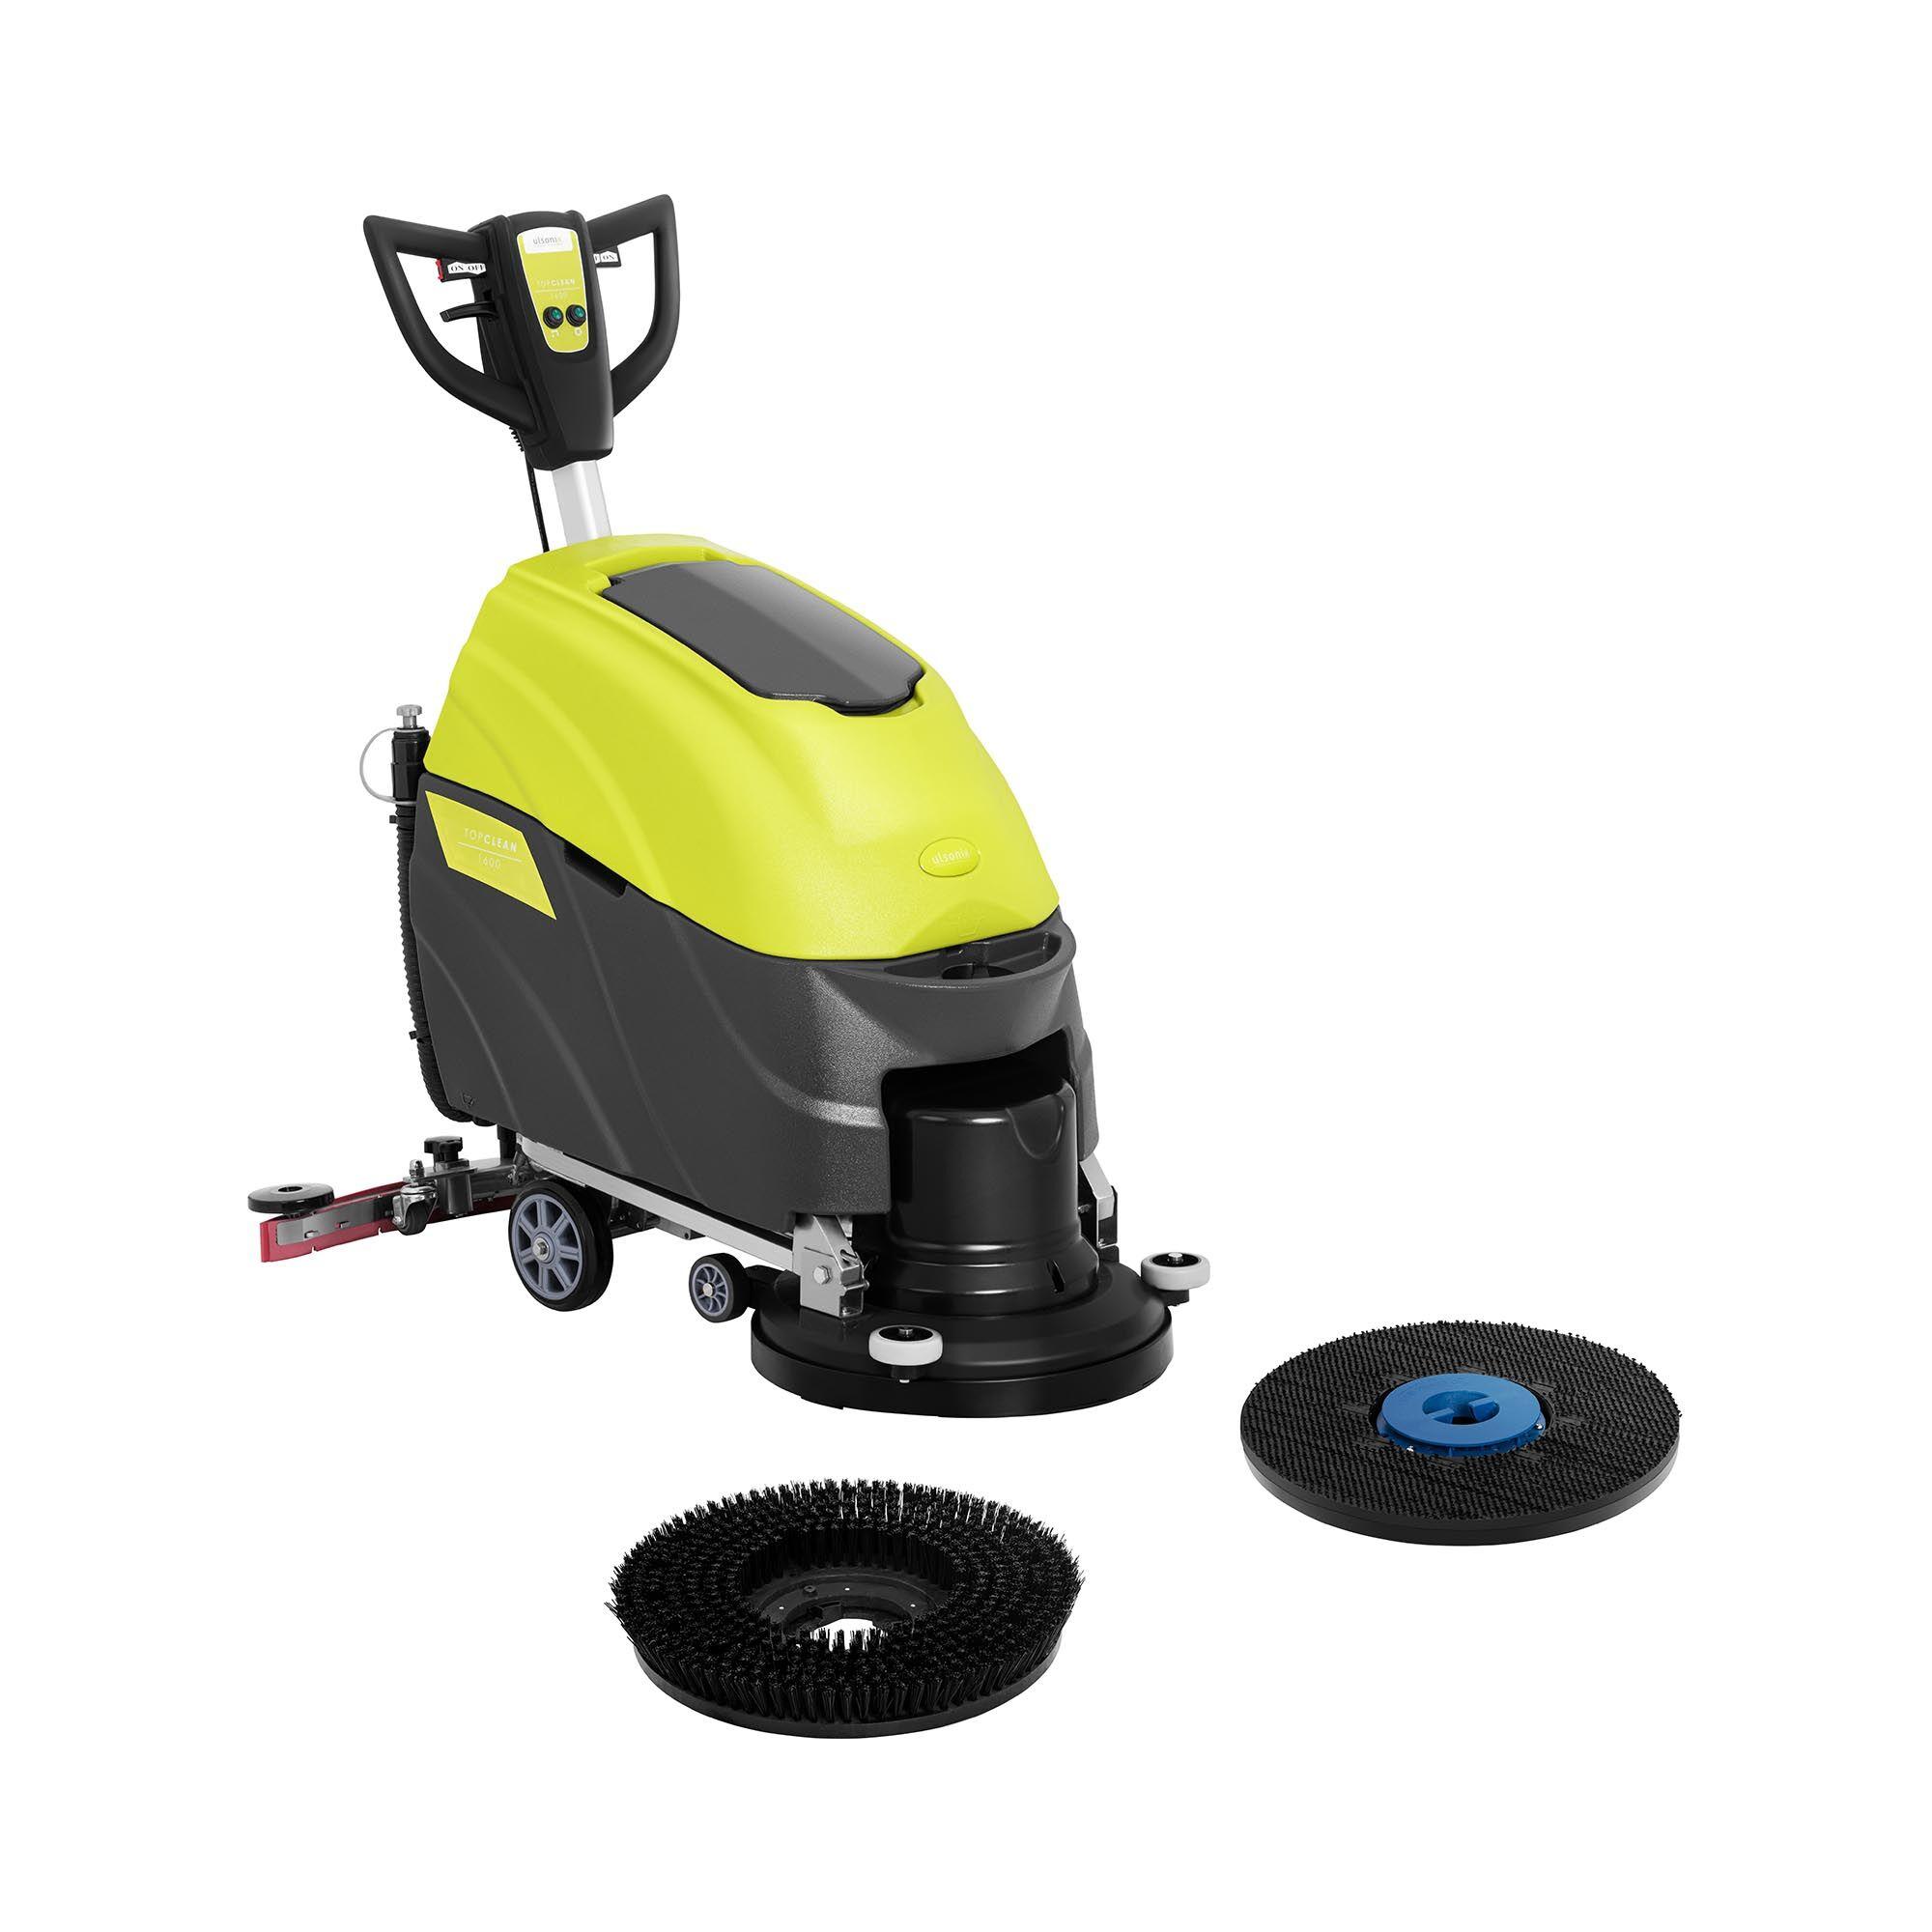 ulsonix Autolaveuse - 45,5 cm - 1 600 m²/h